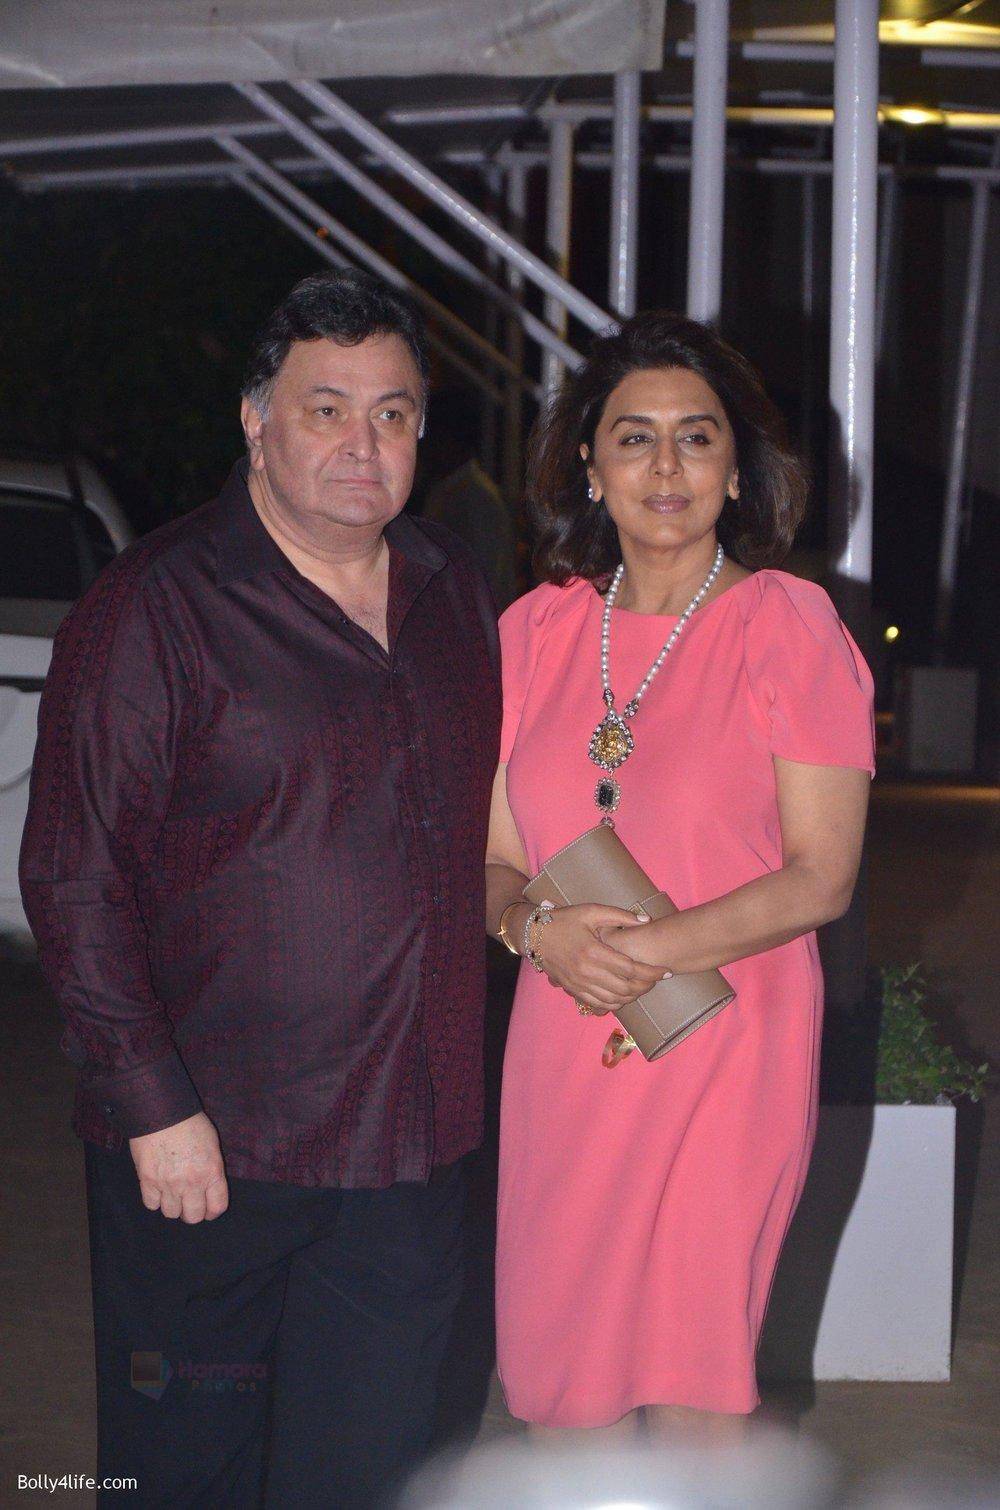 Rishi-Kapoor-Neetu-Singh-at-Reema-jain-bday-party-in-Amadeus-NCPA-on-28th-Sept-2016-774.jpg